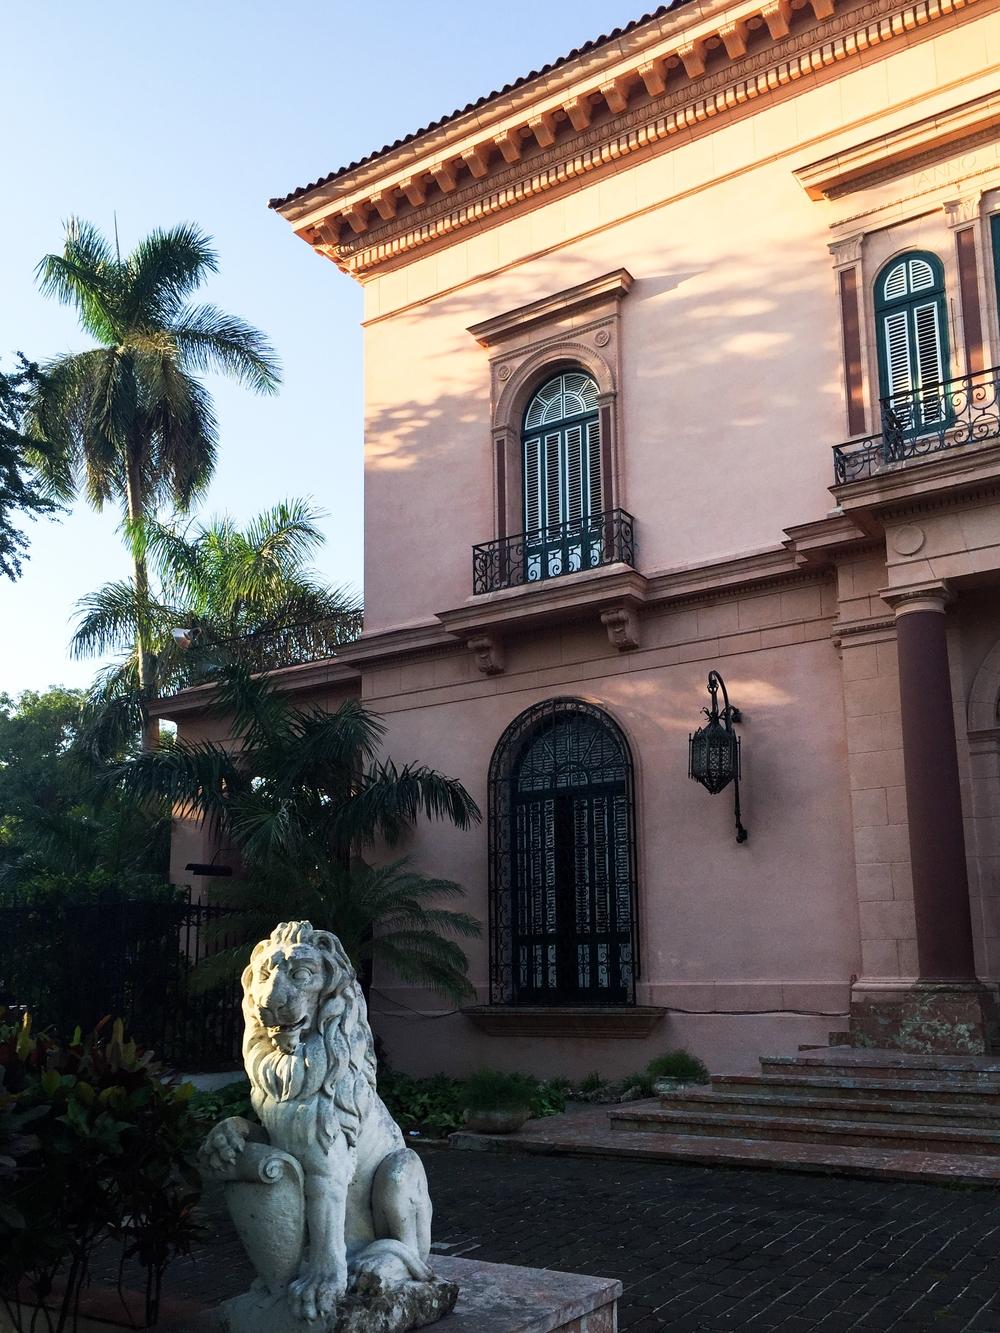 CASA DE LA AMISTAD, HAVANA, CUBA